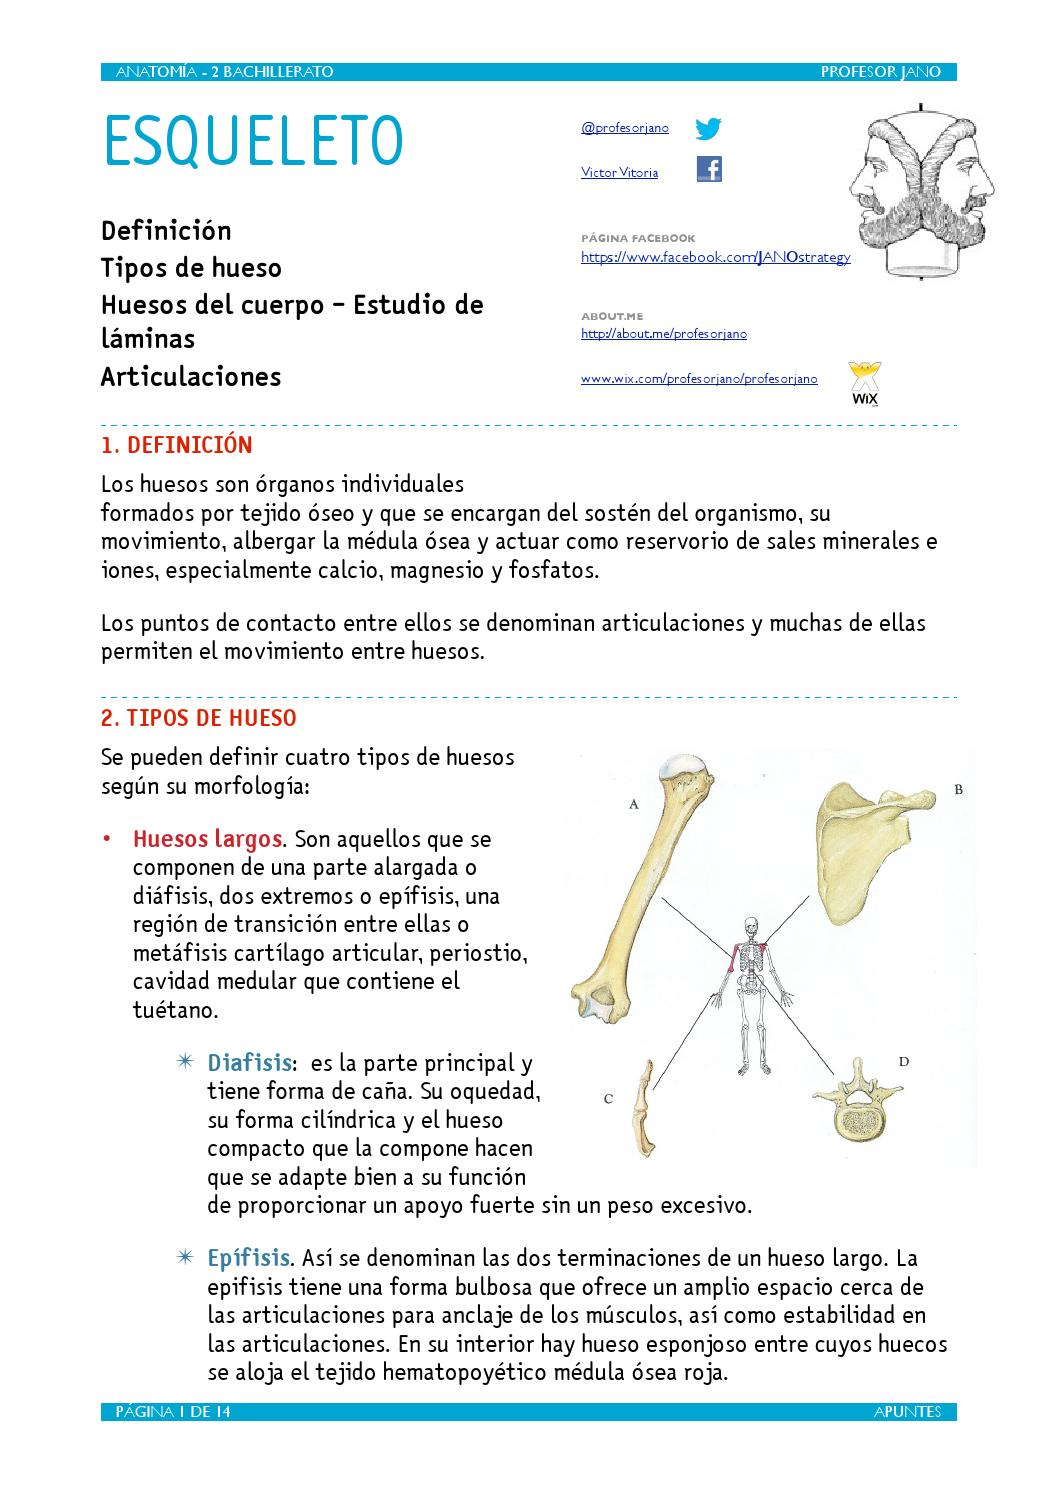 Apuntes esqueleto by VÍCTOR M. VITORIA - issuu